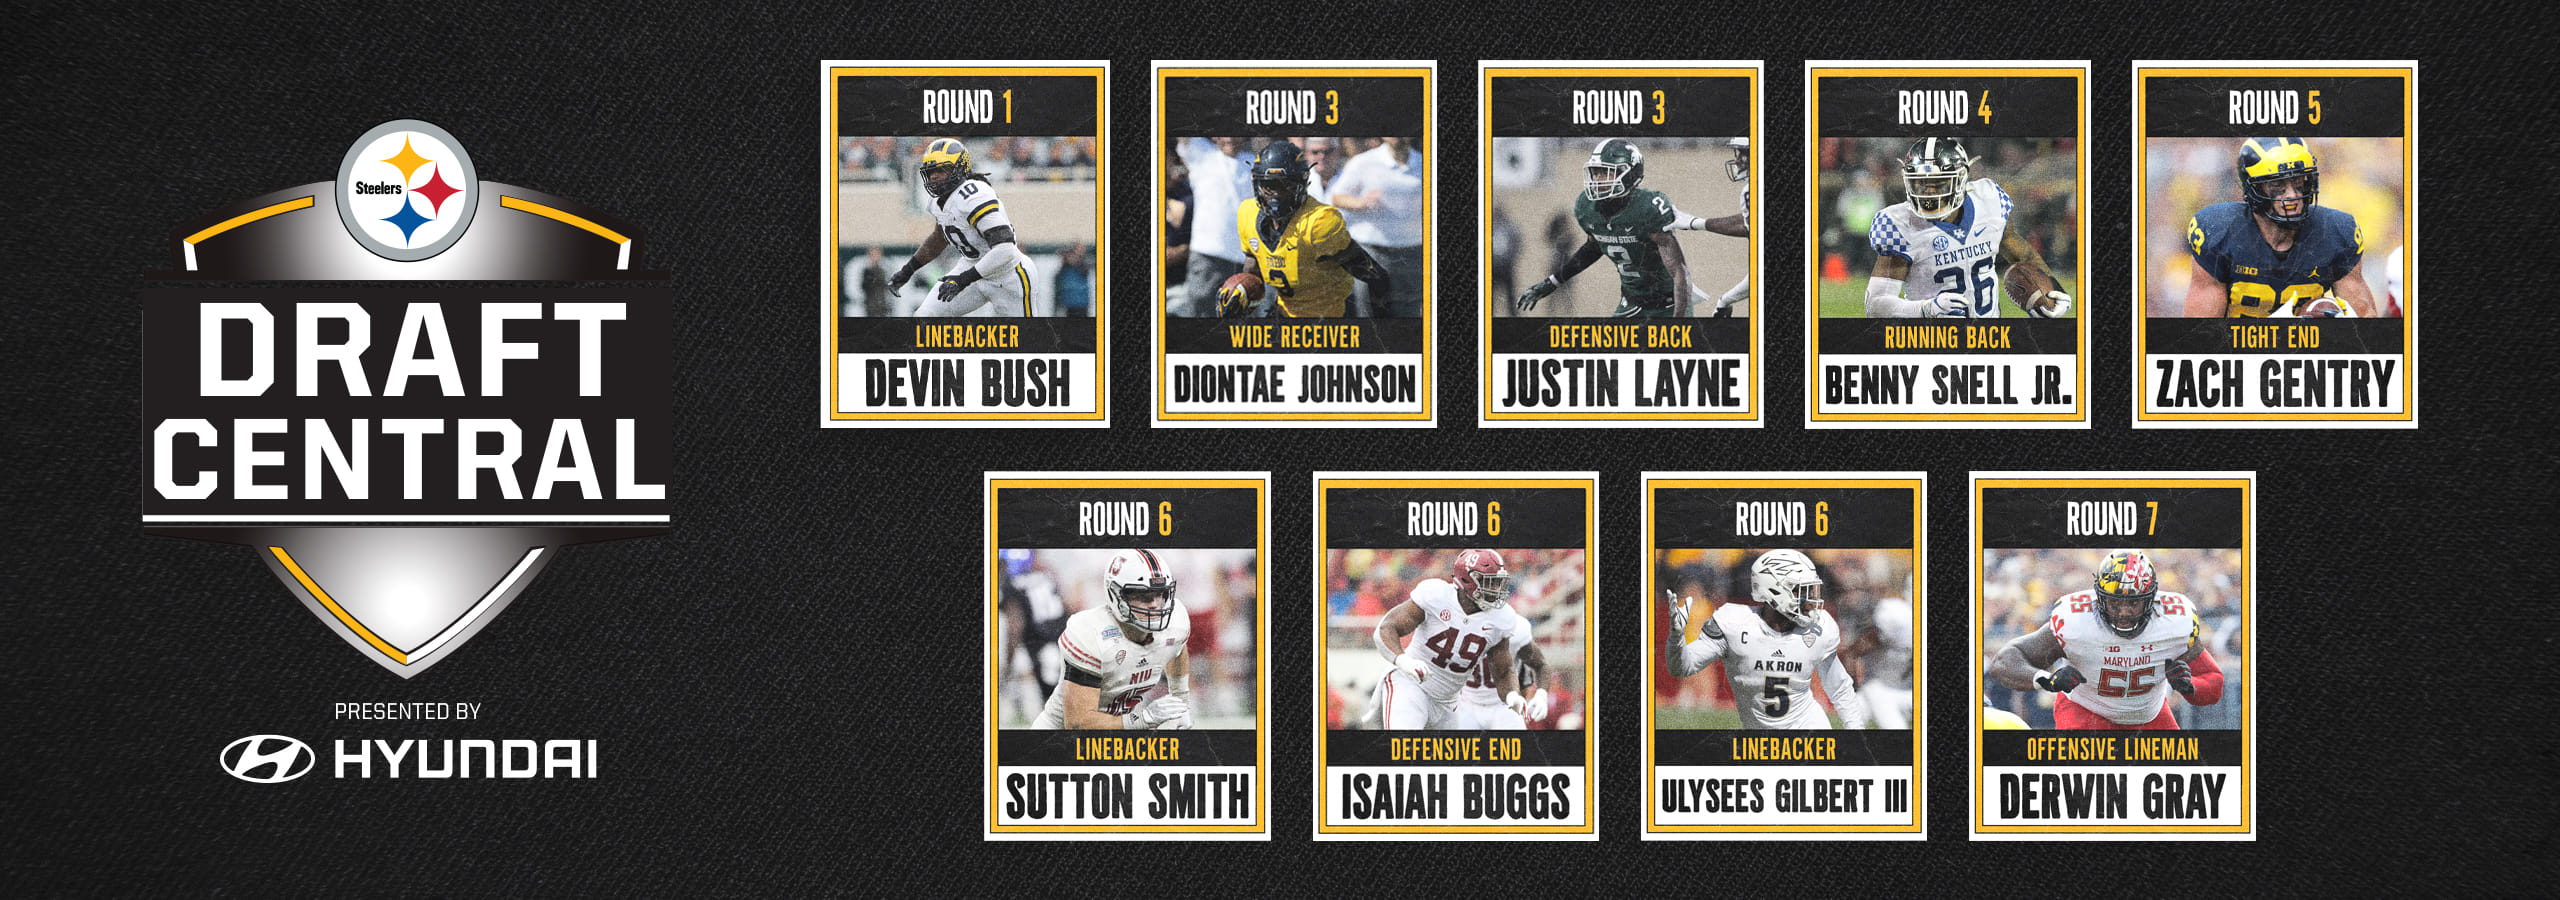 Nfl Draft Pittsburgh Steelers Steelers Com